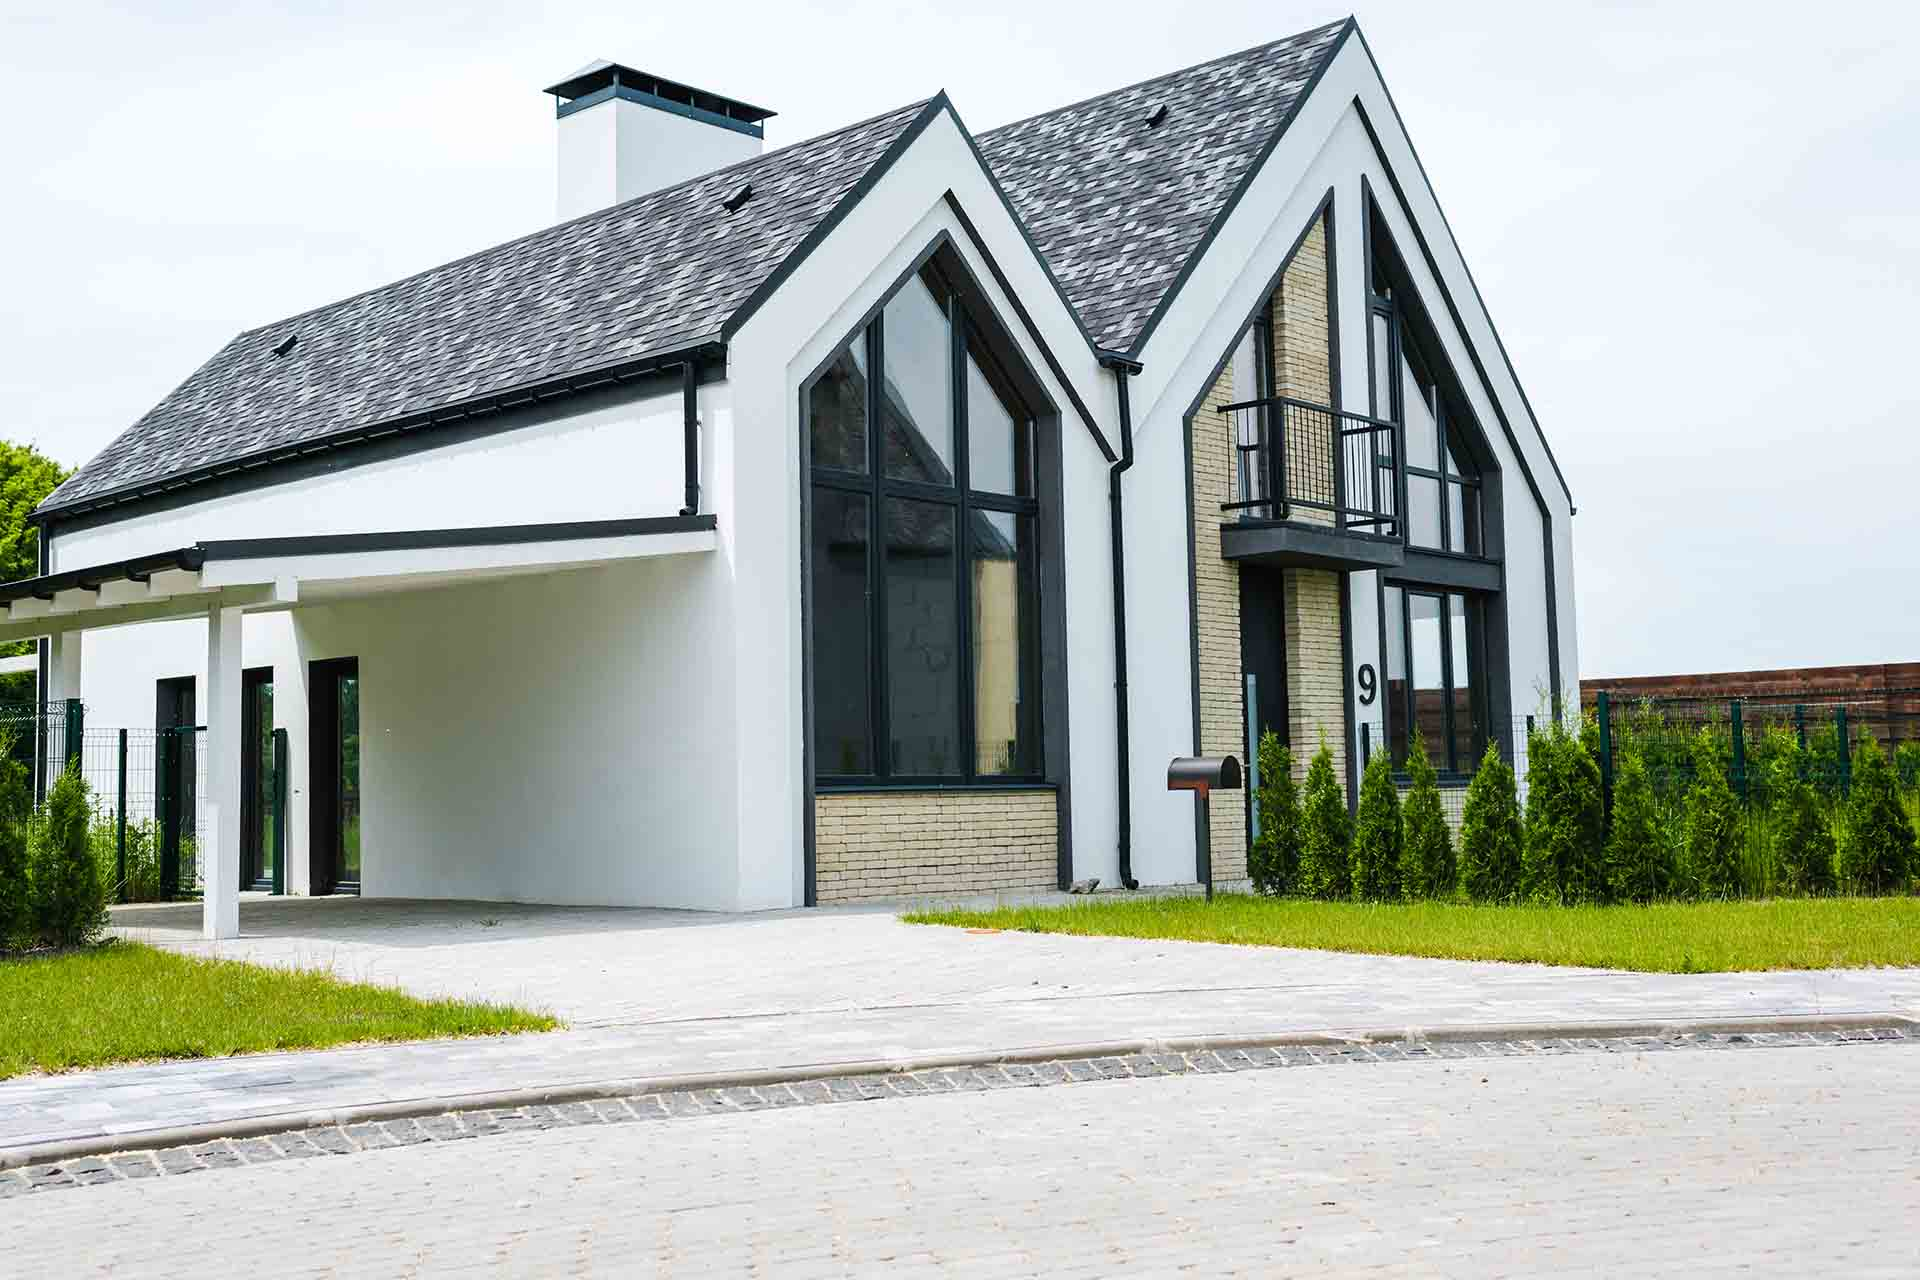 5 steps to choosing a windows and door installer